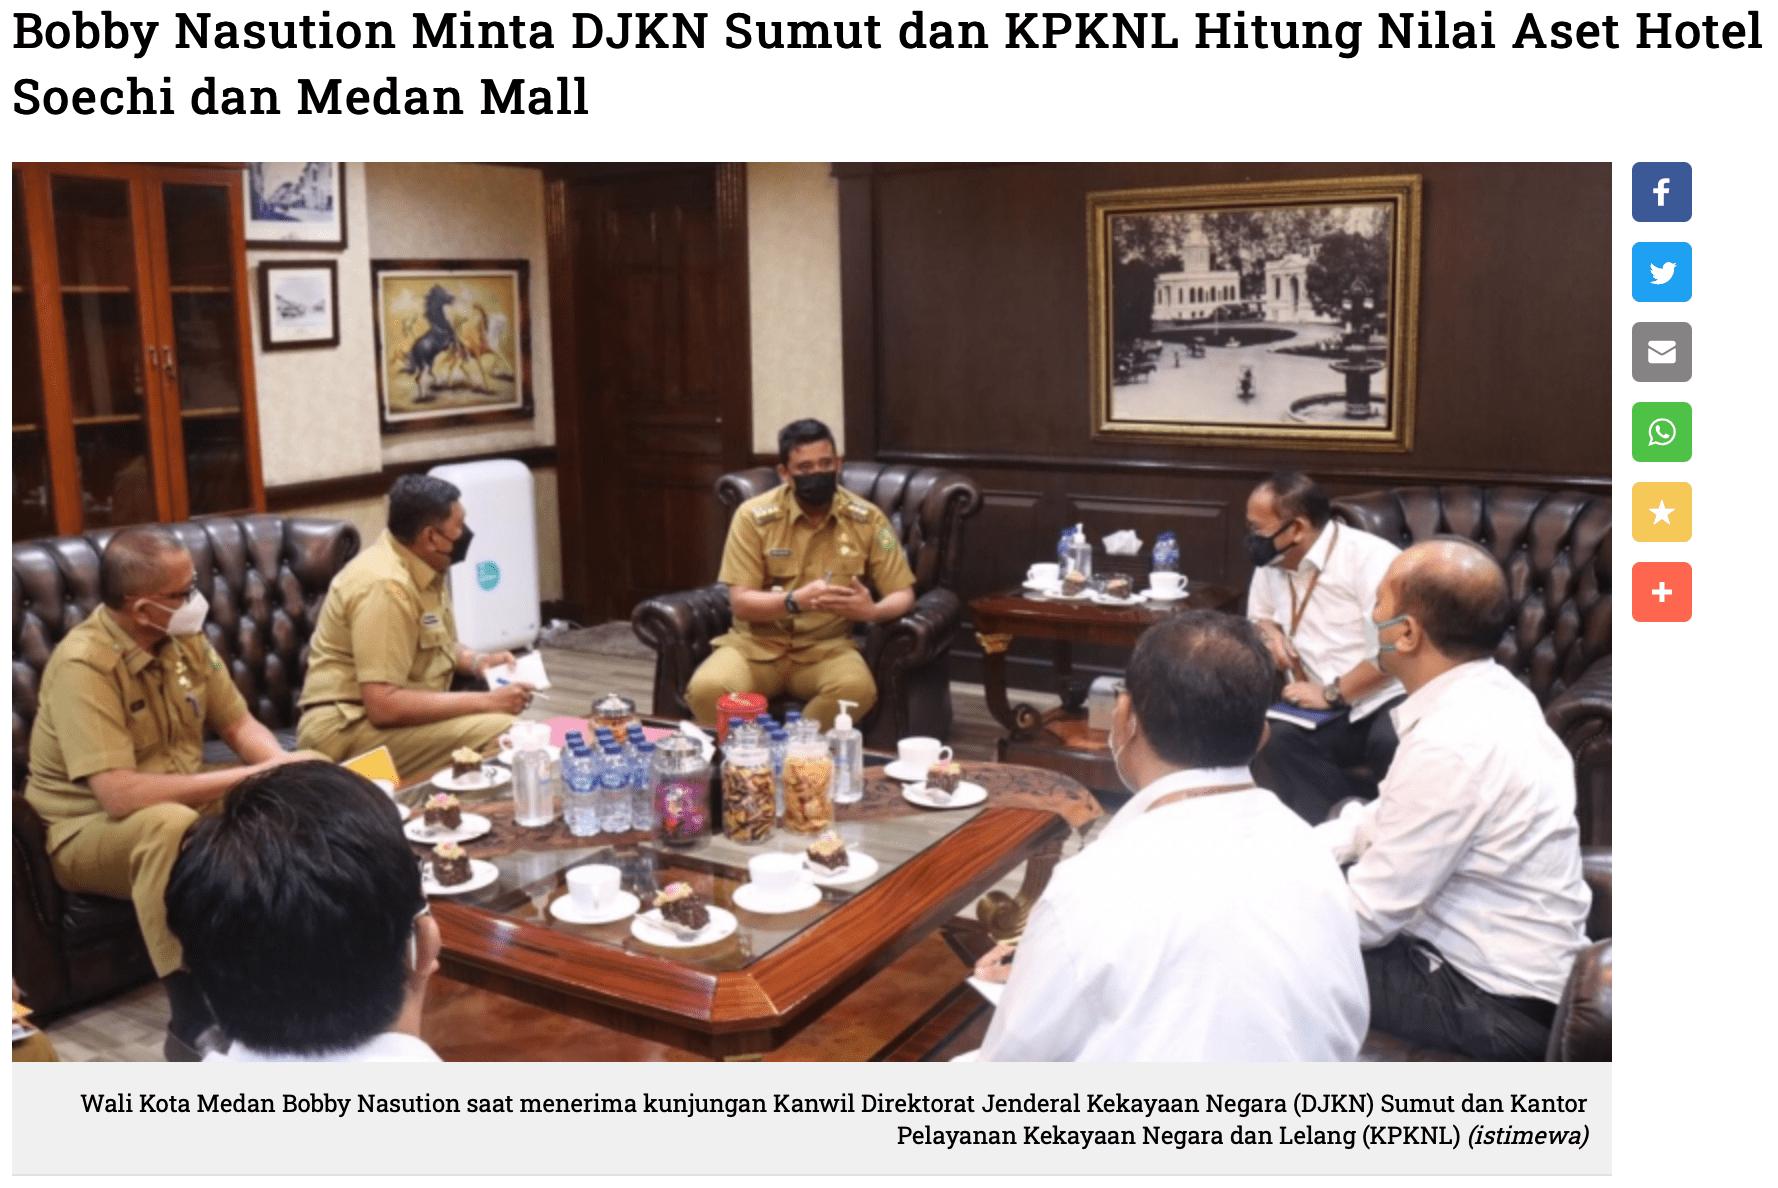 Bobby Nasution Minta DJKN Sumut dan KPKNL Hitung Nilai Aset Hotel Soechi dan Medan Mall